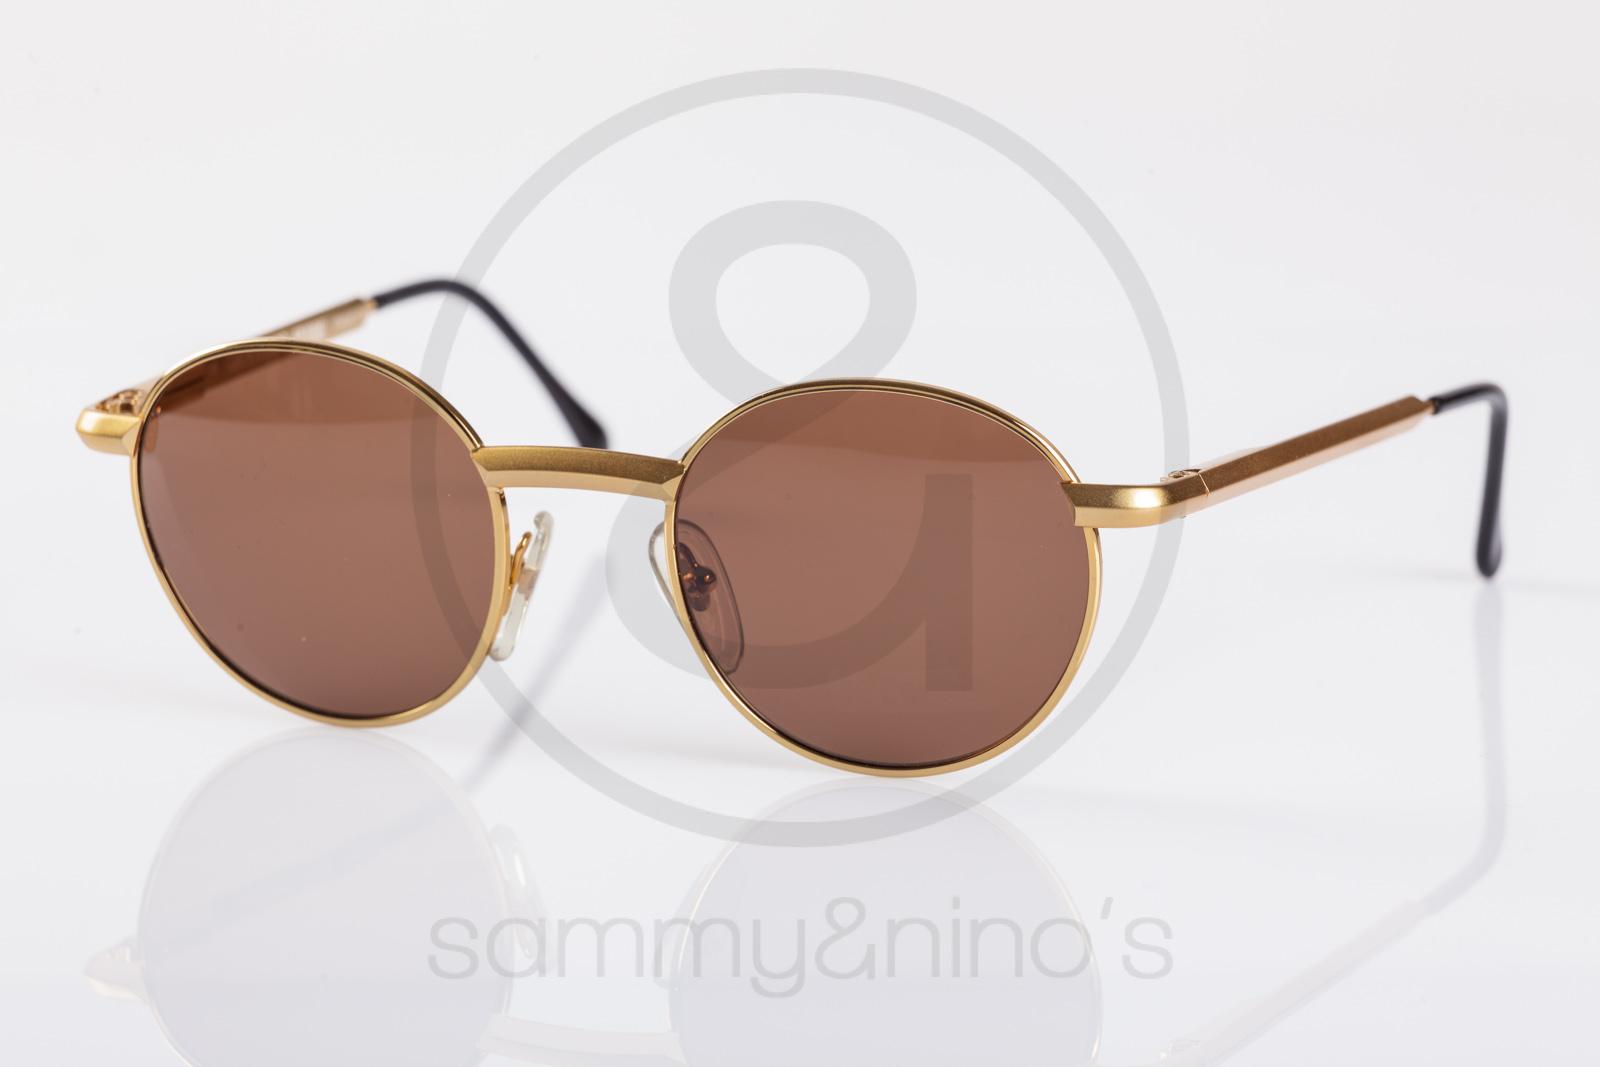 c9d47ee01b5 Versace Gianfranco Ferre Sunglasses t